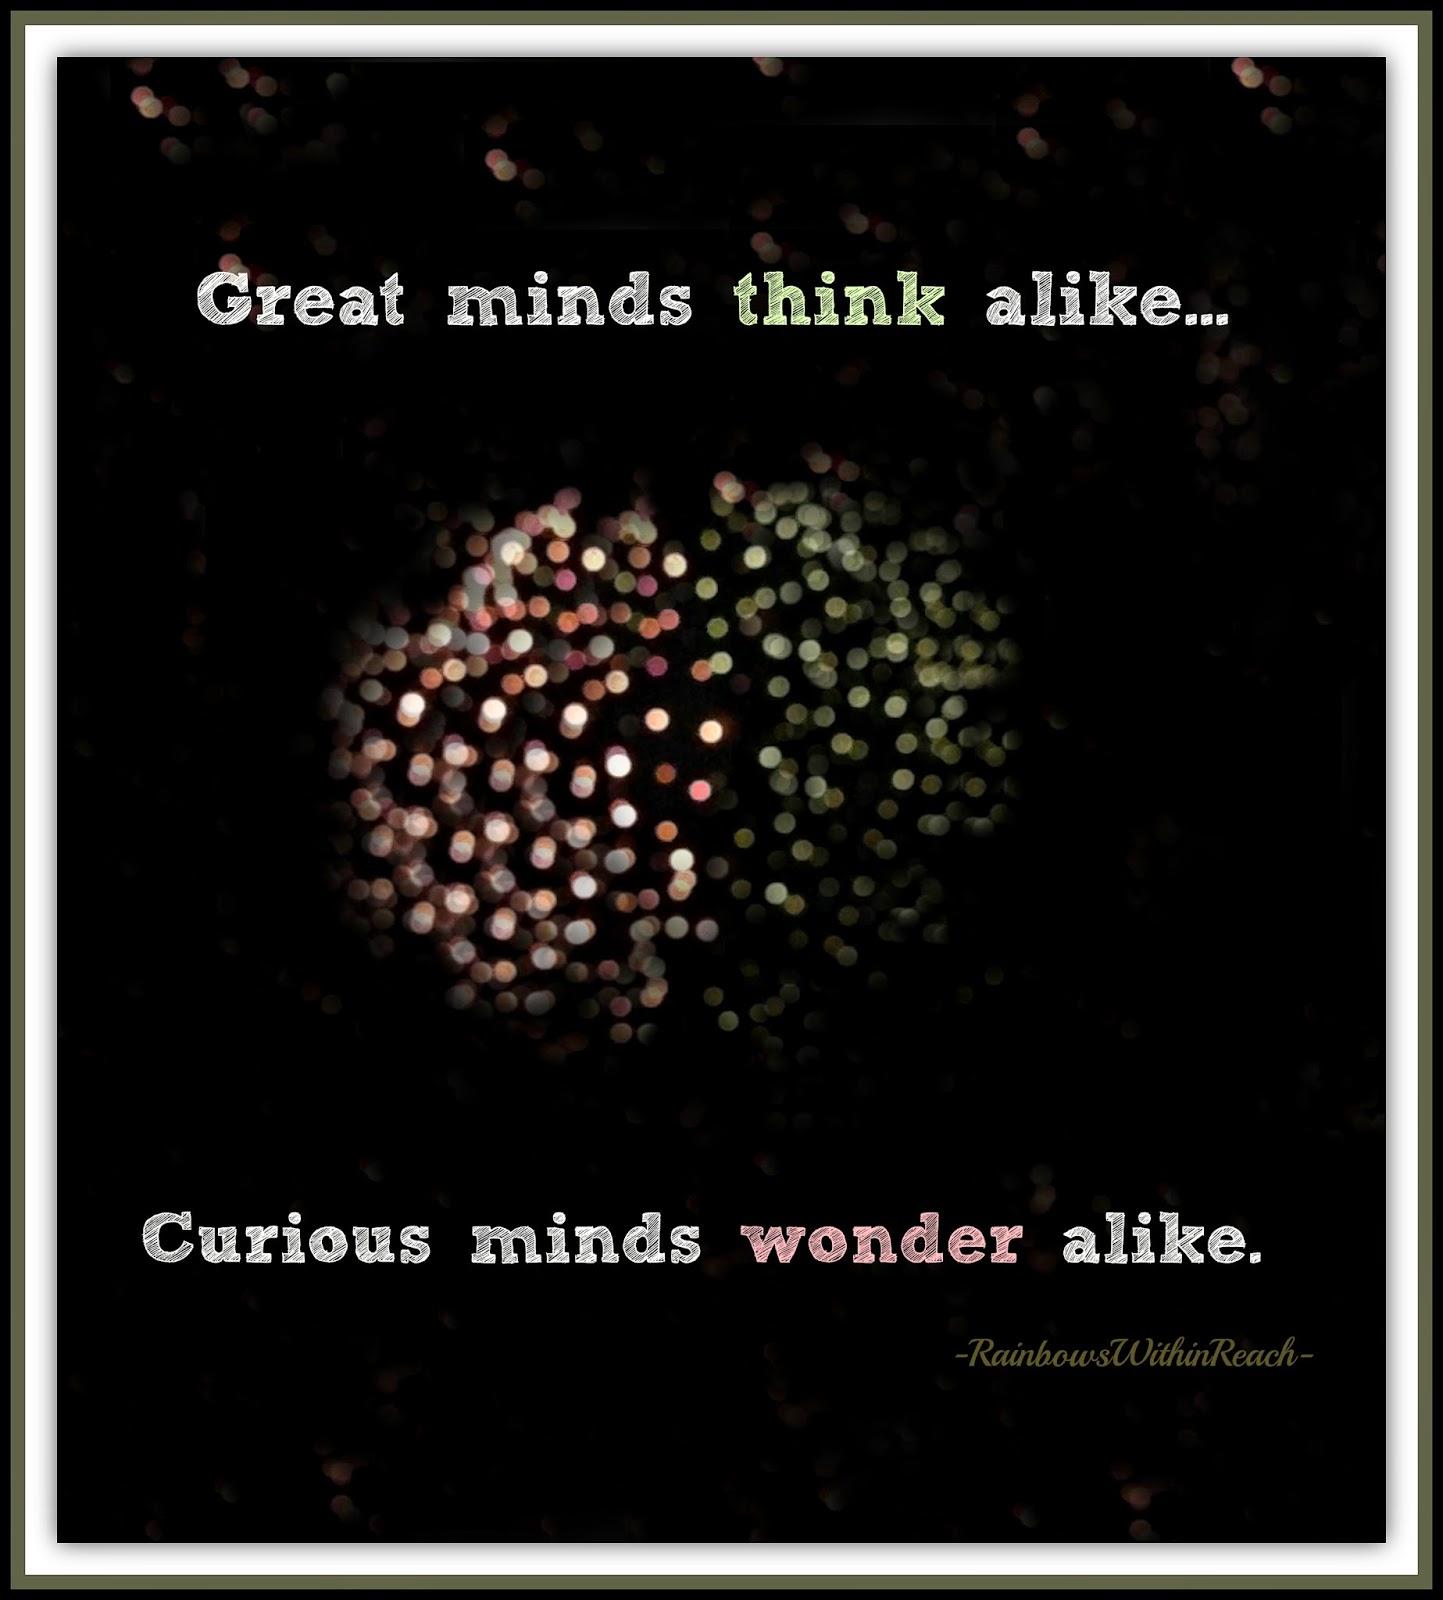 """Great Minds Think Alike: Creative Minds Wonder Alike"" at RainbowsWithinReach"